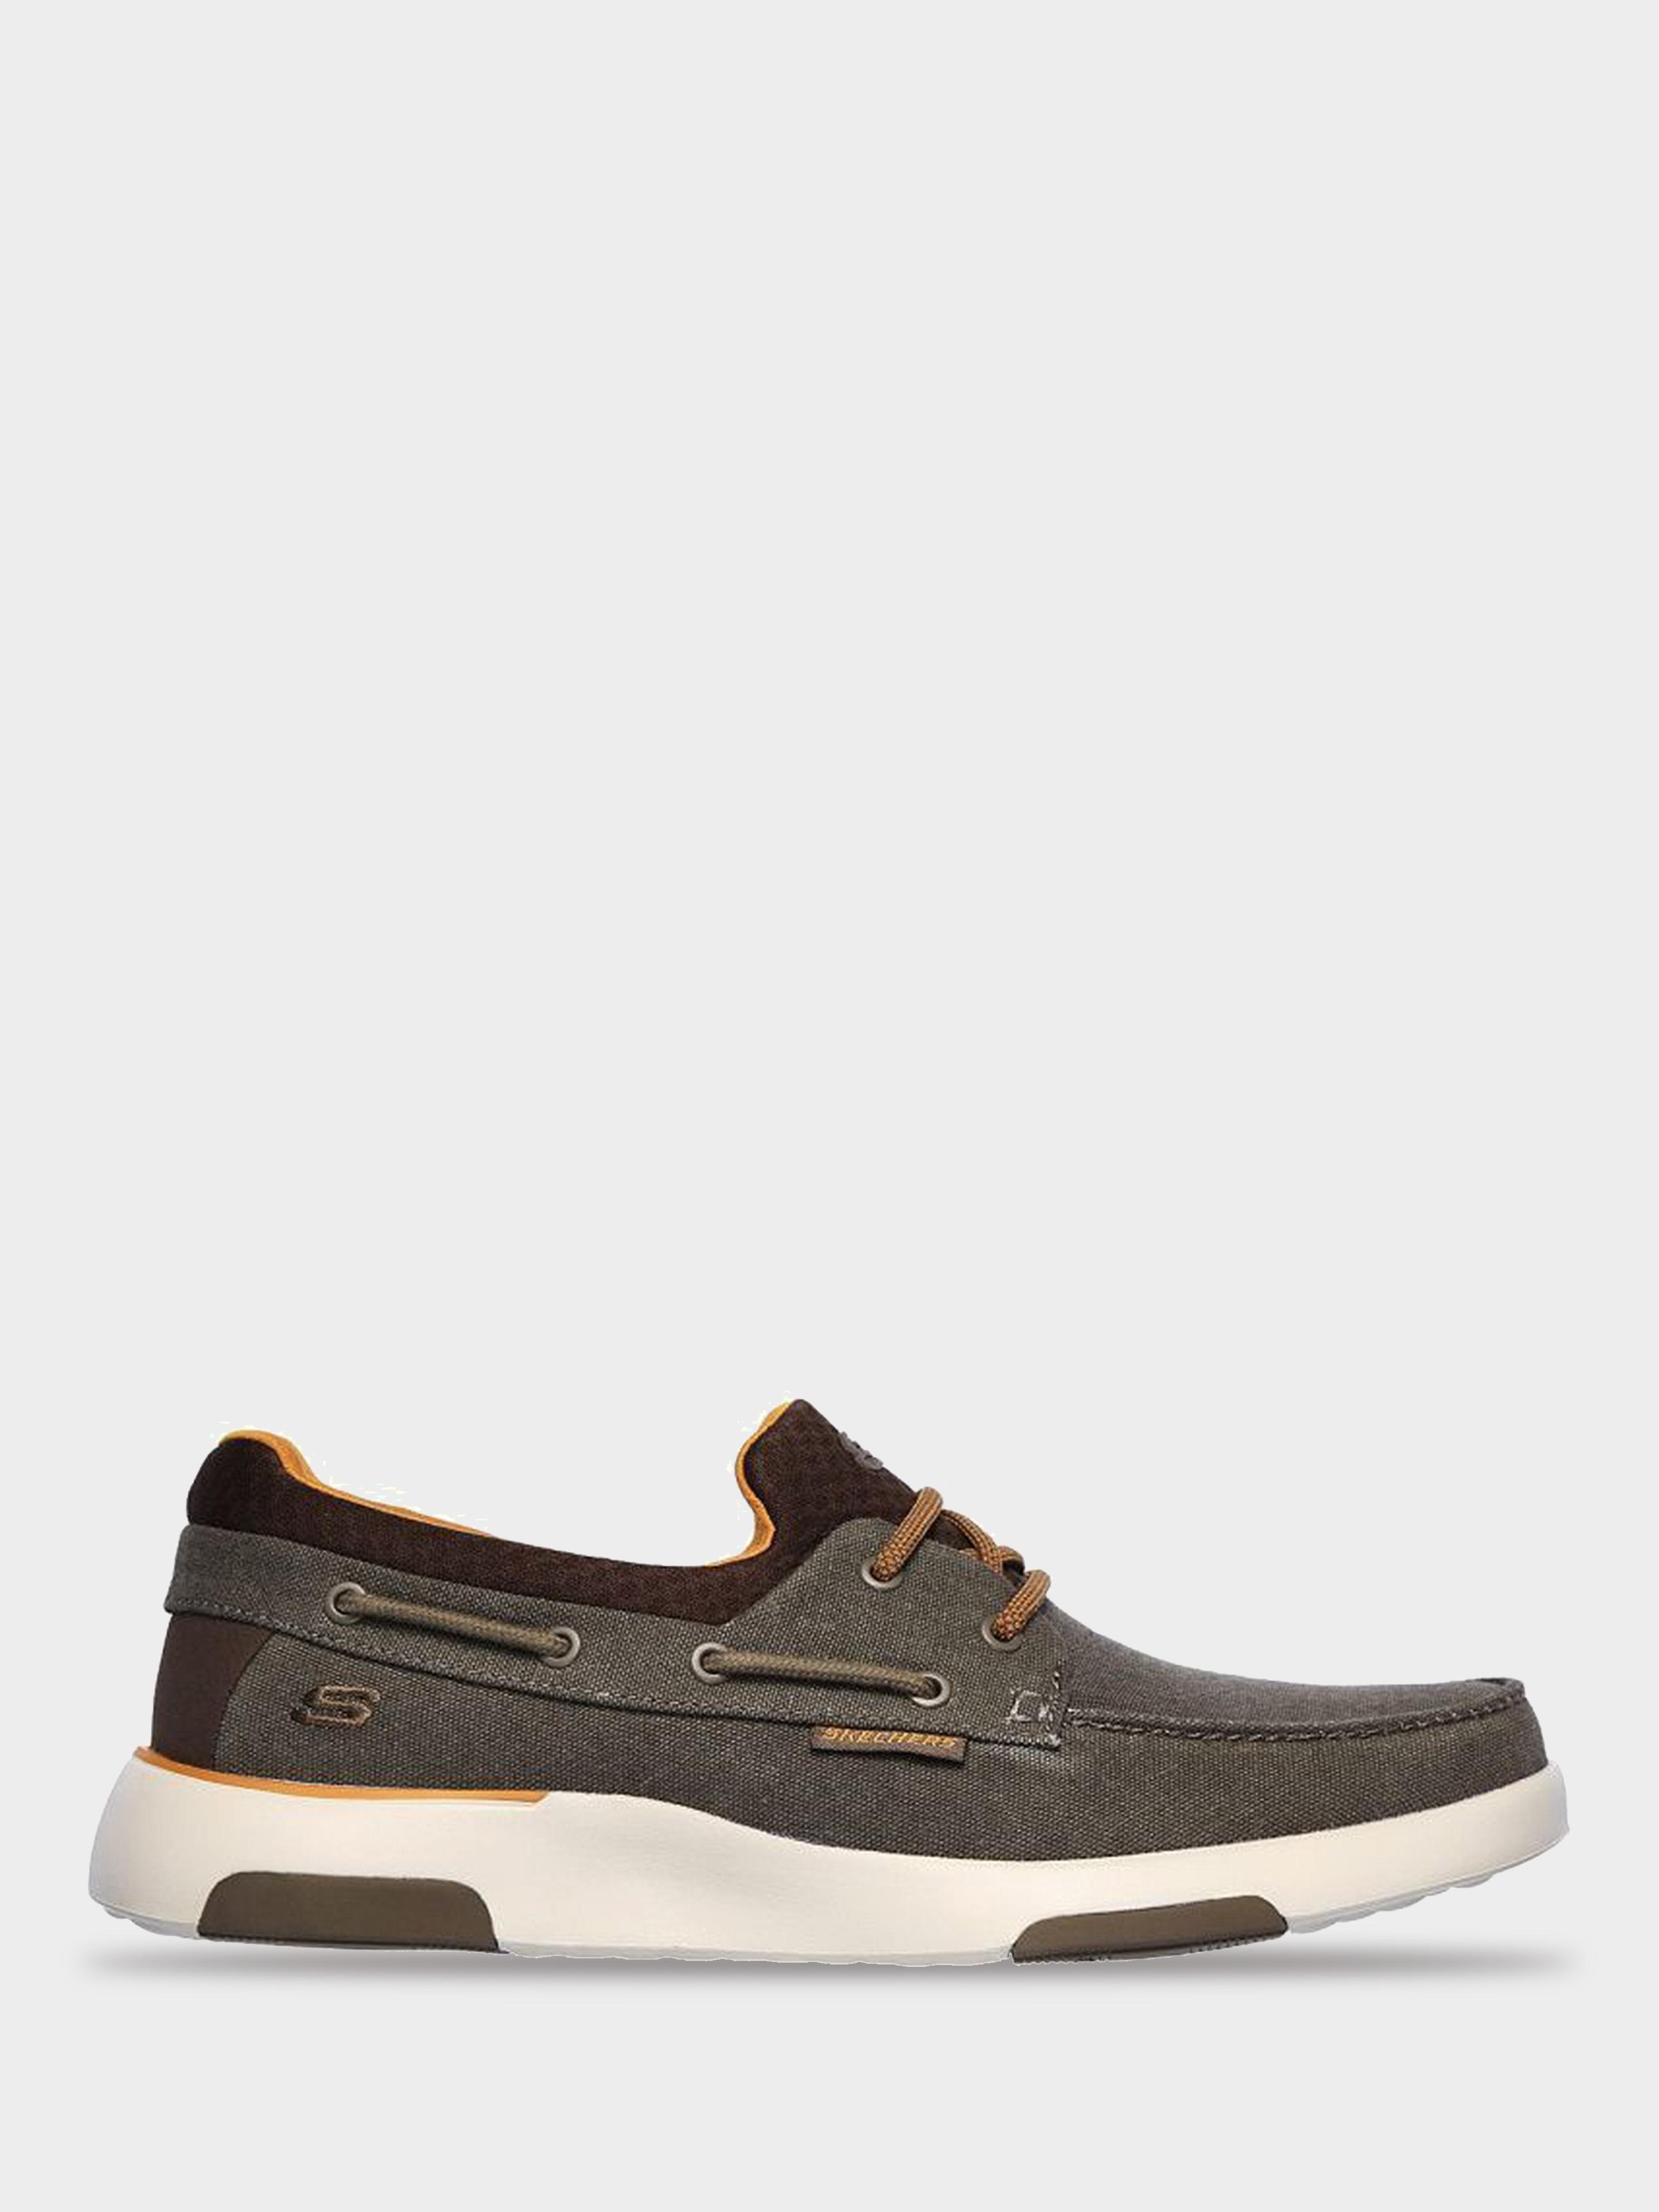 Полуботинки для мужчин Skechers KM3118 модная обувь, 2017